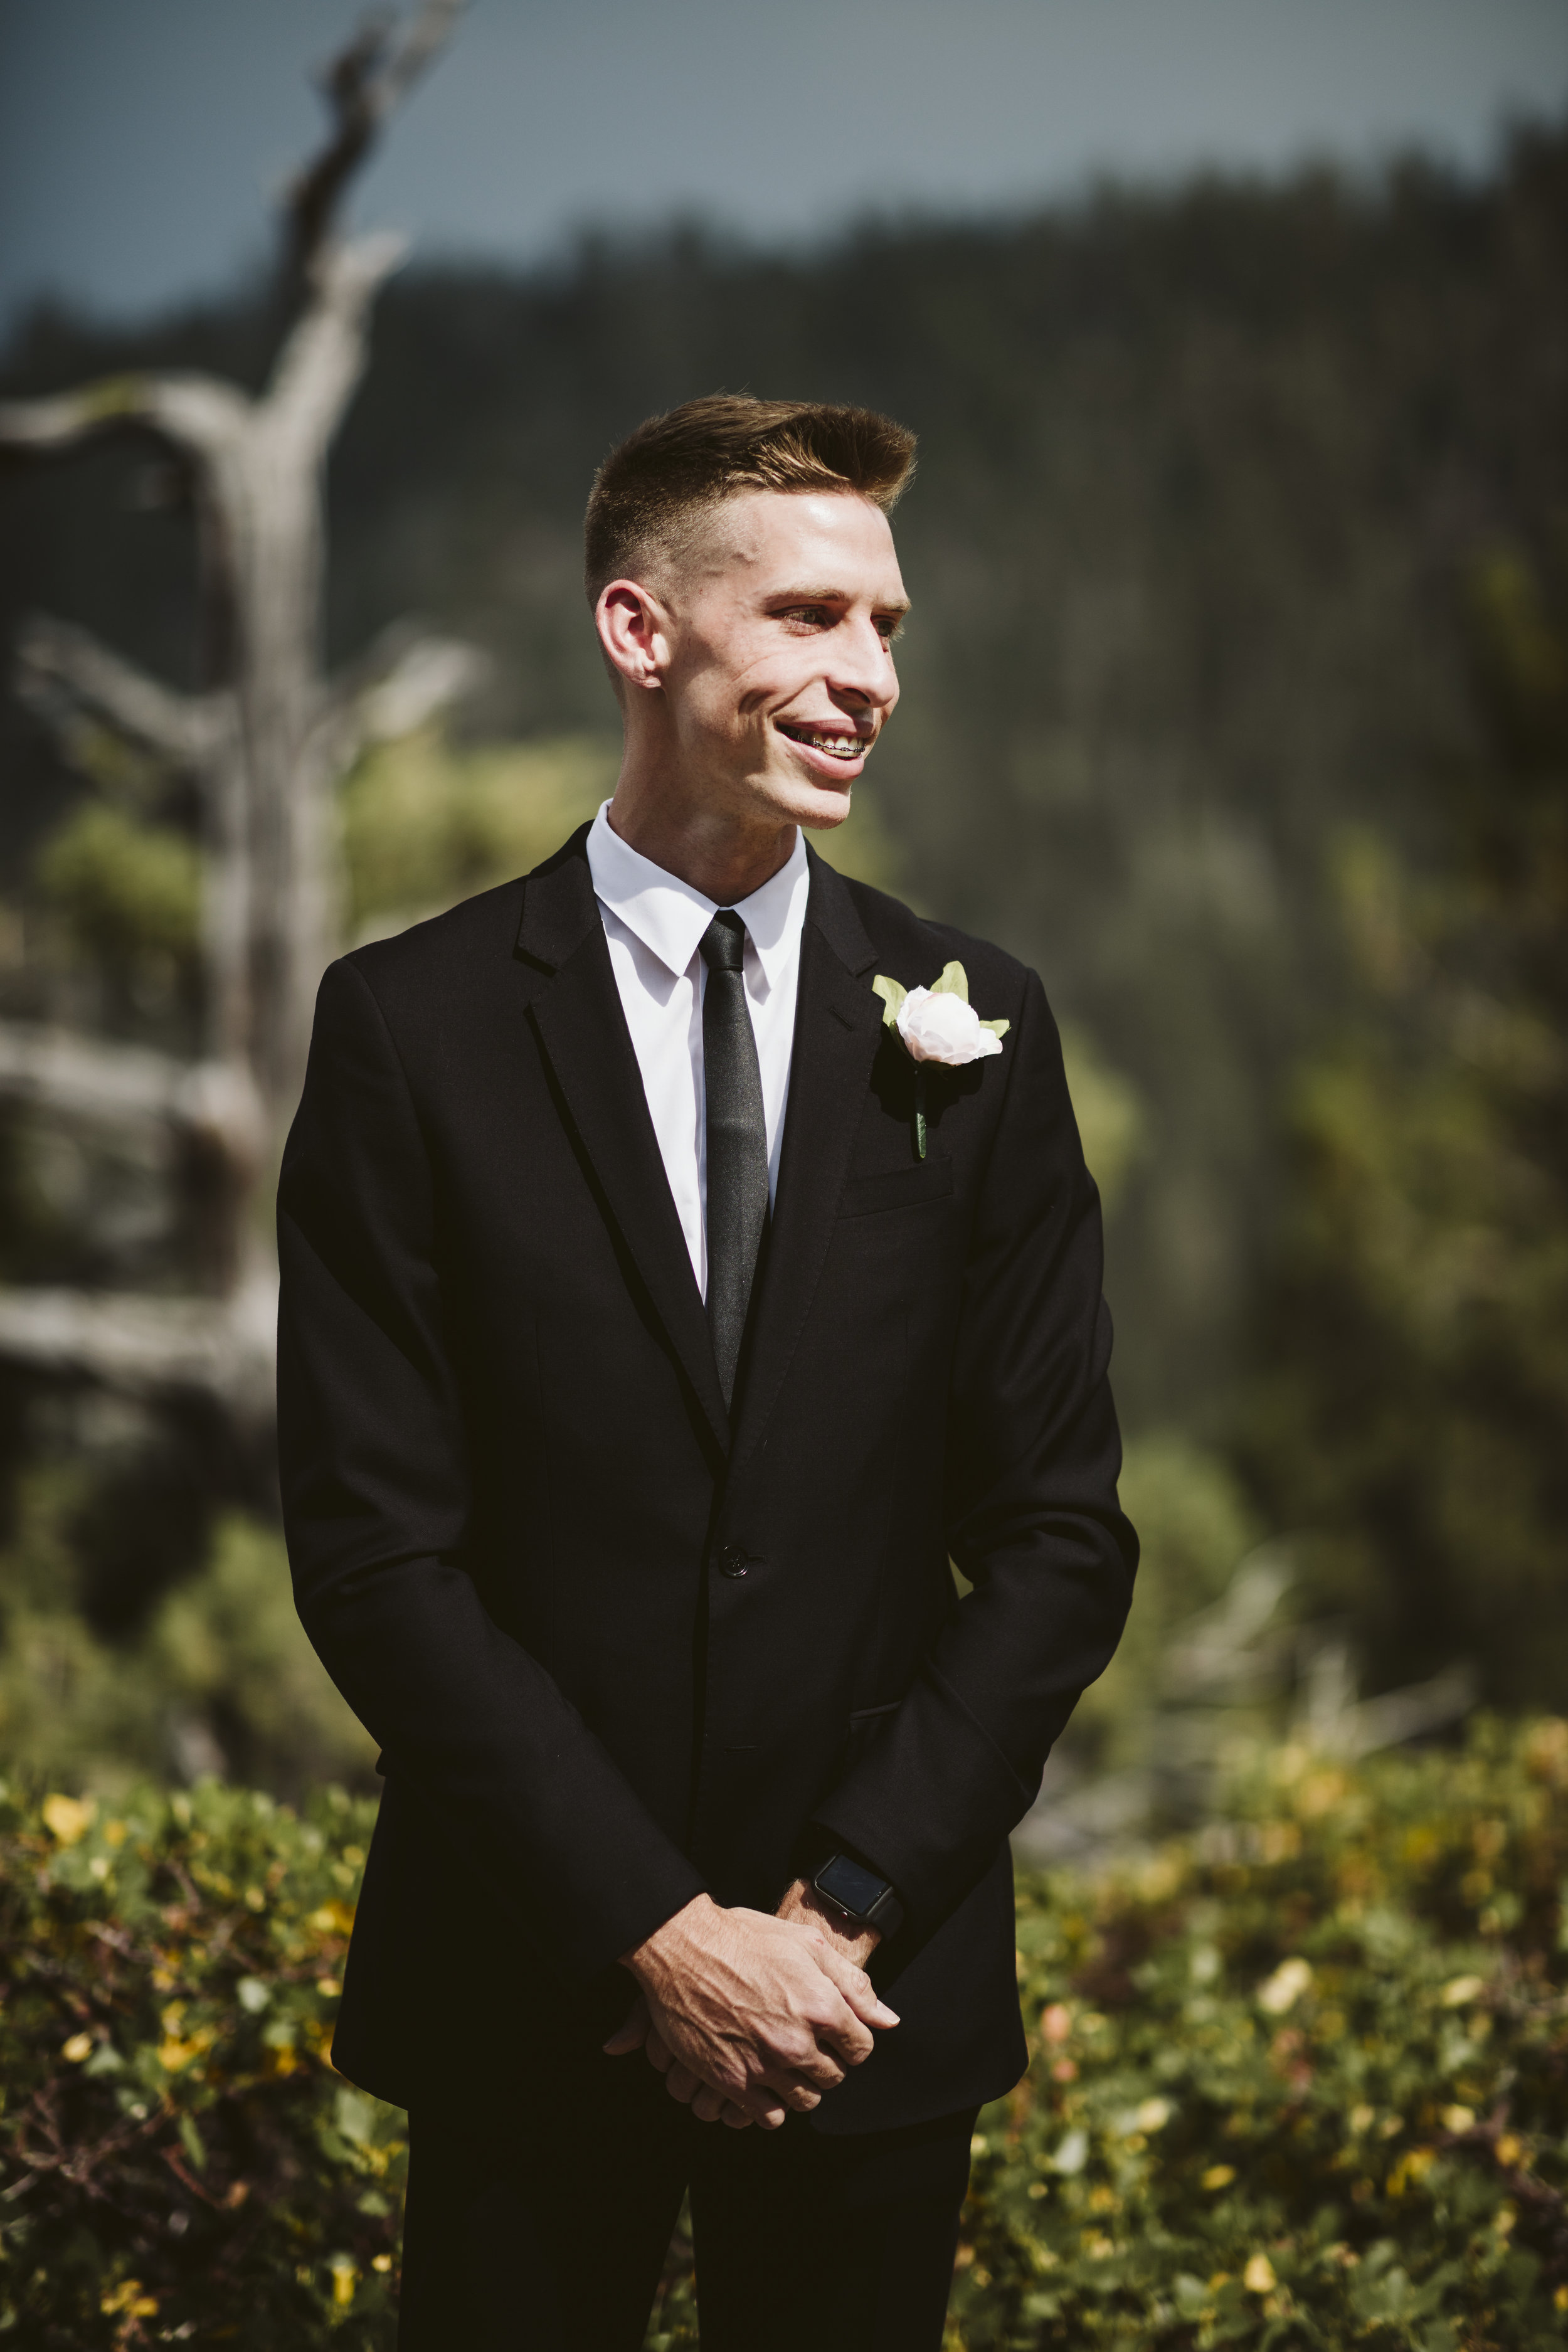 _P8A0204vildphotography-adventurewedding-adventurouswedding-tahoewedding-laketahoewedding-adventureelopement-laketahoeweddingphotographer-wedding-photographer-weddingphotographer-Chase-Sam.jpg